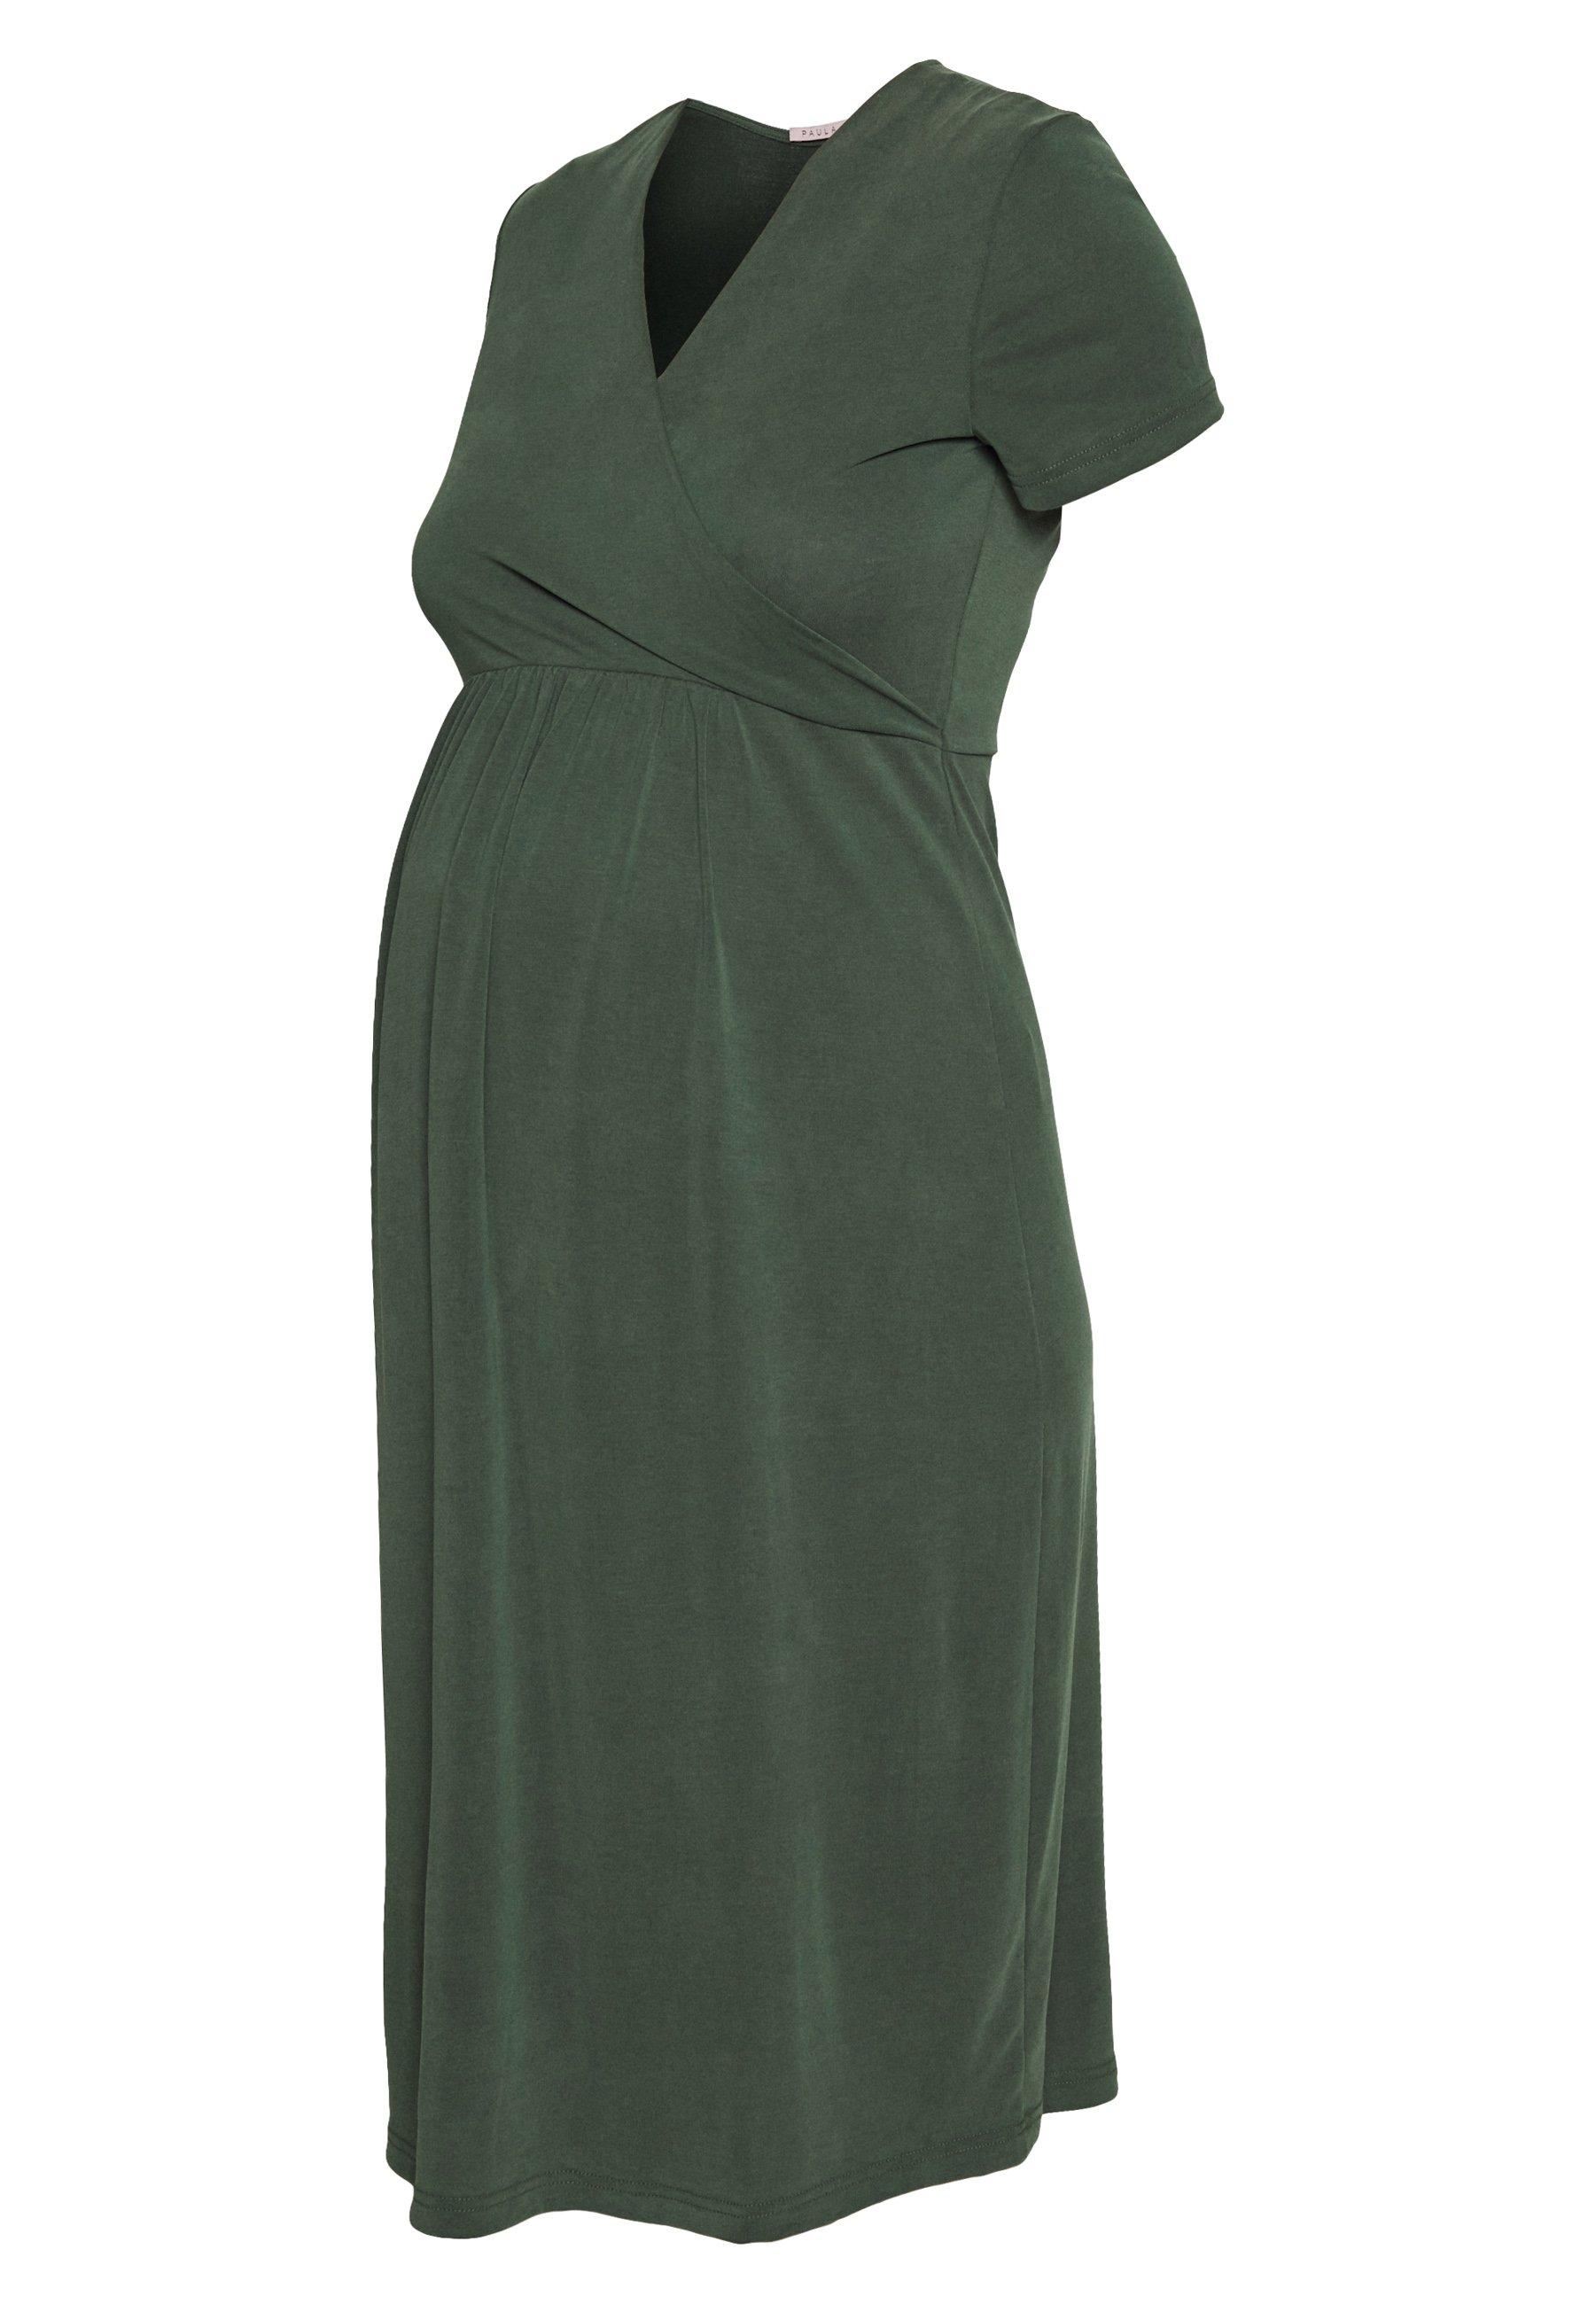 Paula Janz Maternity Jerseyklänning - Anthracite